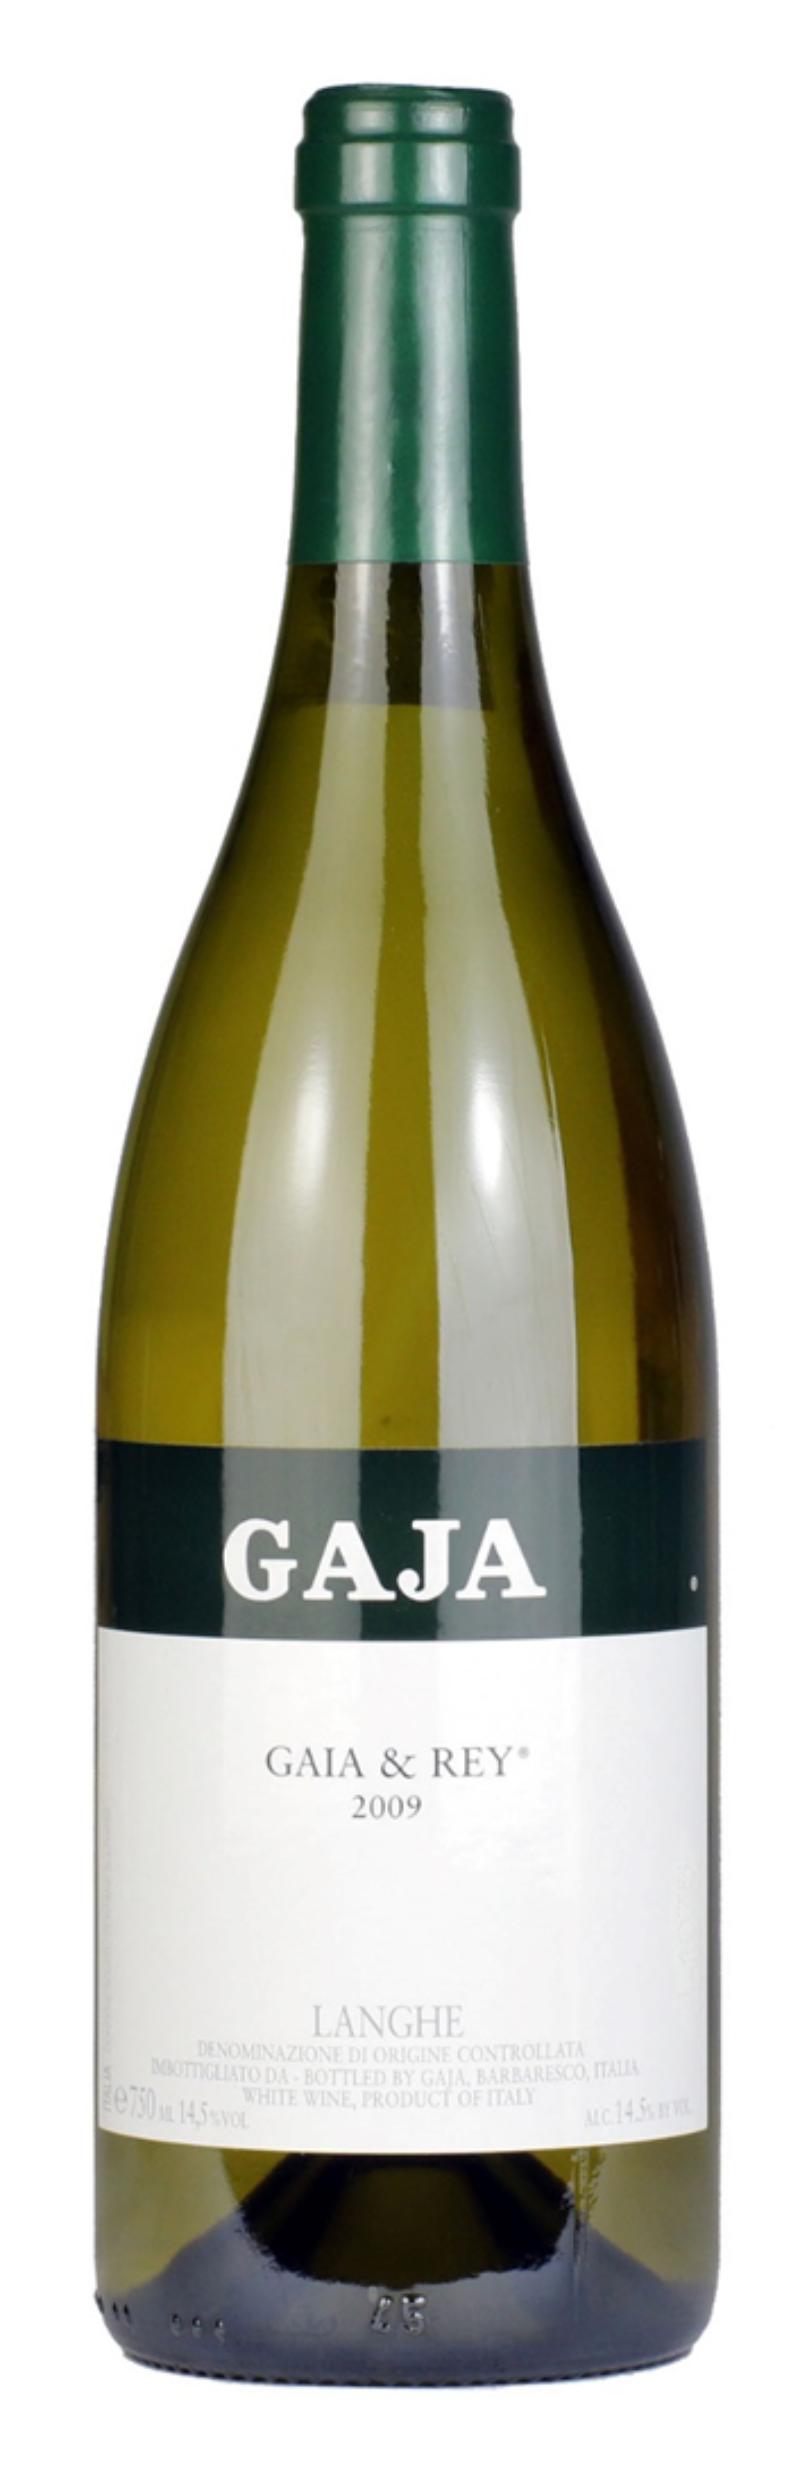 GAJA-&-REY-LANGHE-DOC-2005